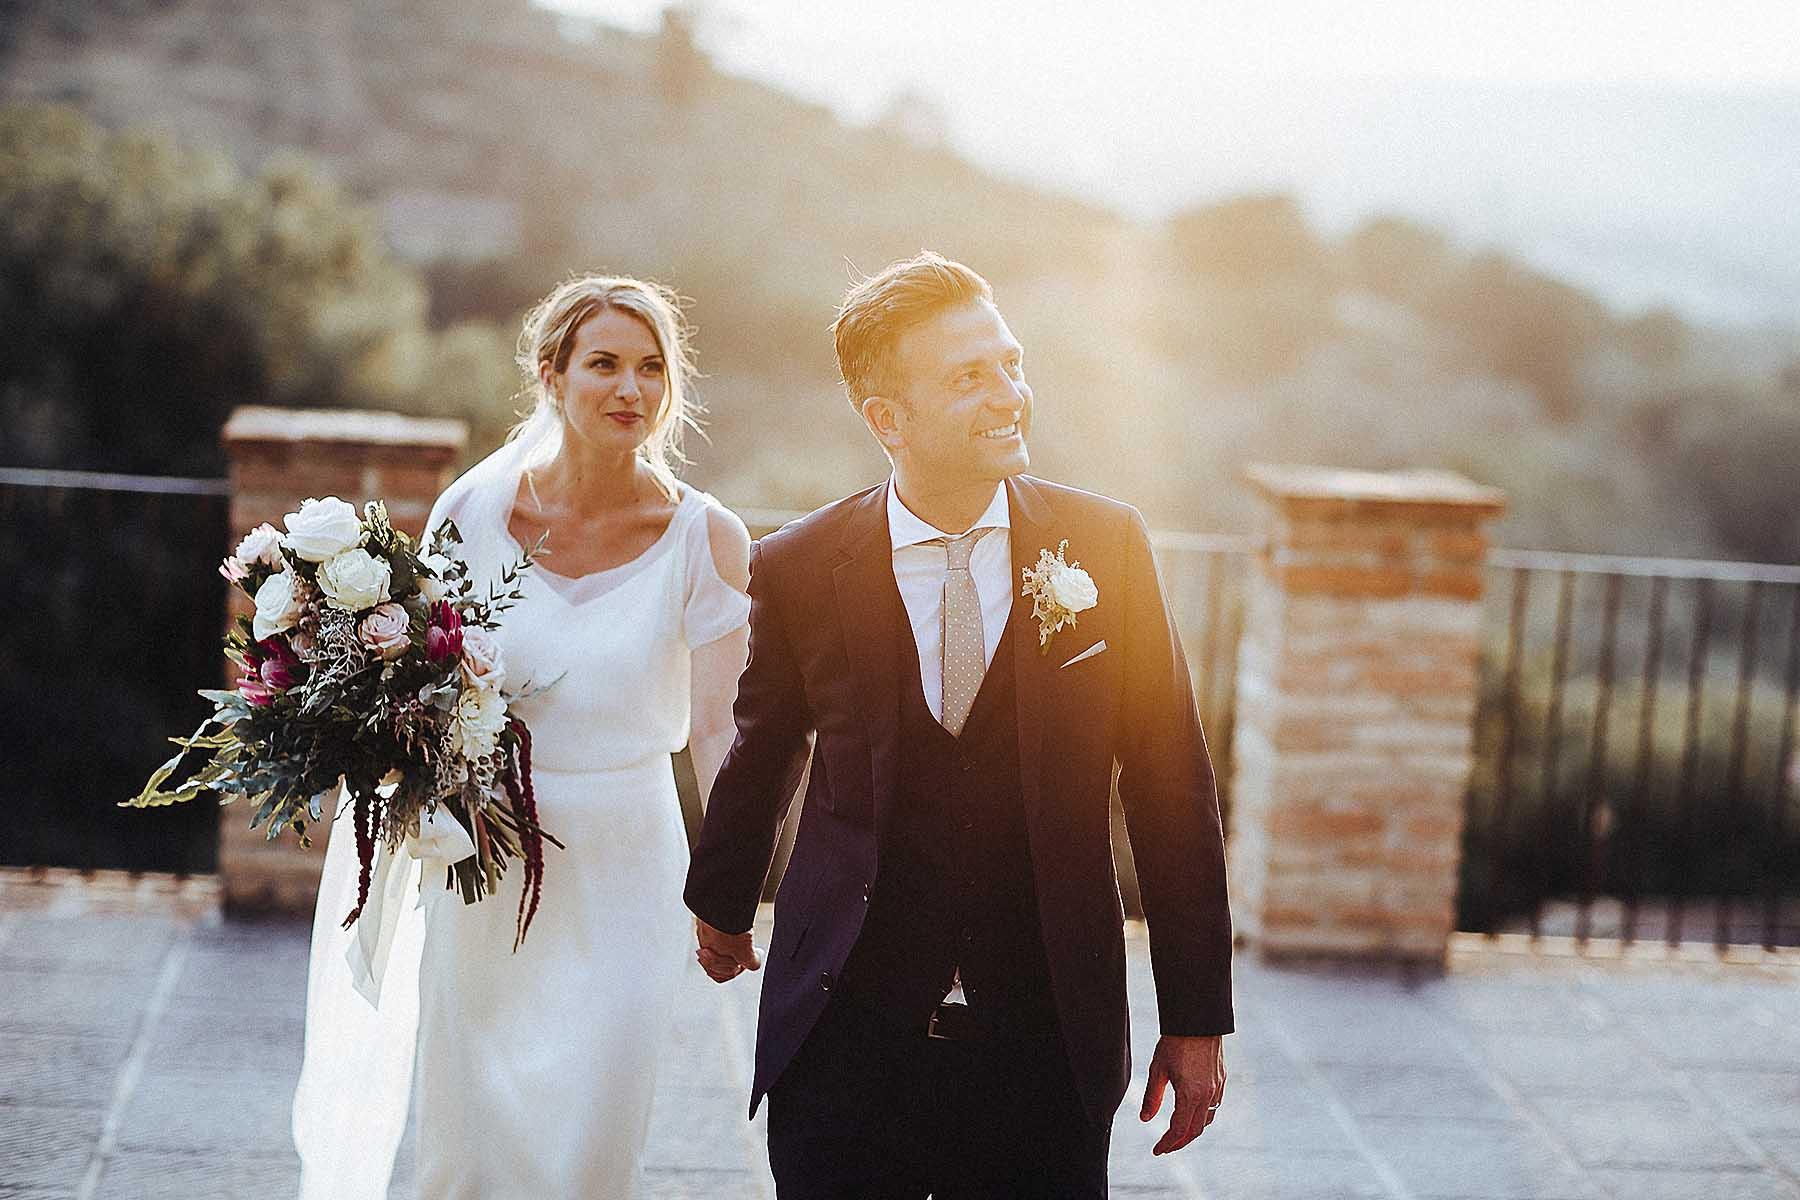 wedding rosciano castle italy 104.jpg